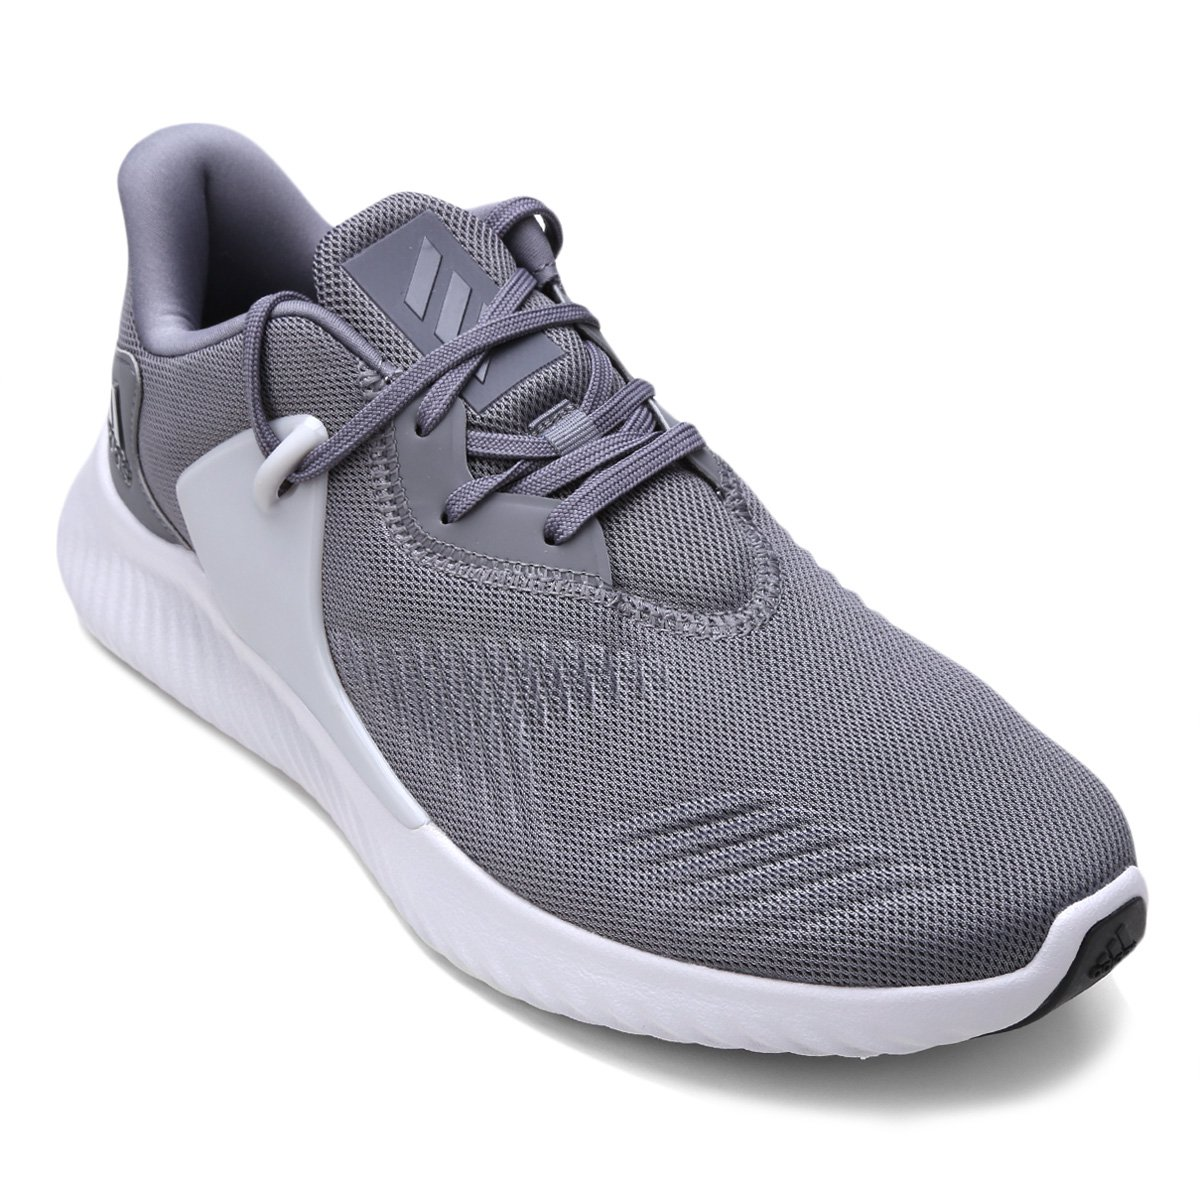 new products dbd8b 7dfa6 Tênis Adidas Alphabounce Rc 2 Masculino - Cinza - Compre Agora  Allianz  Parque Shop